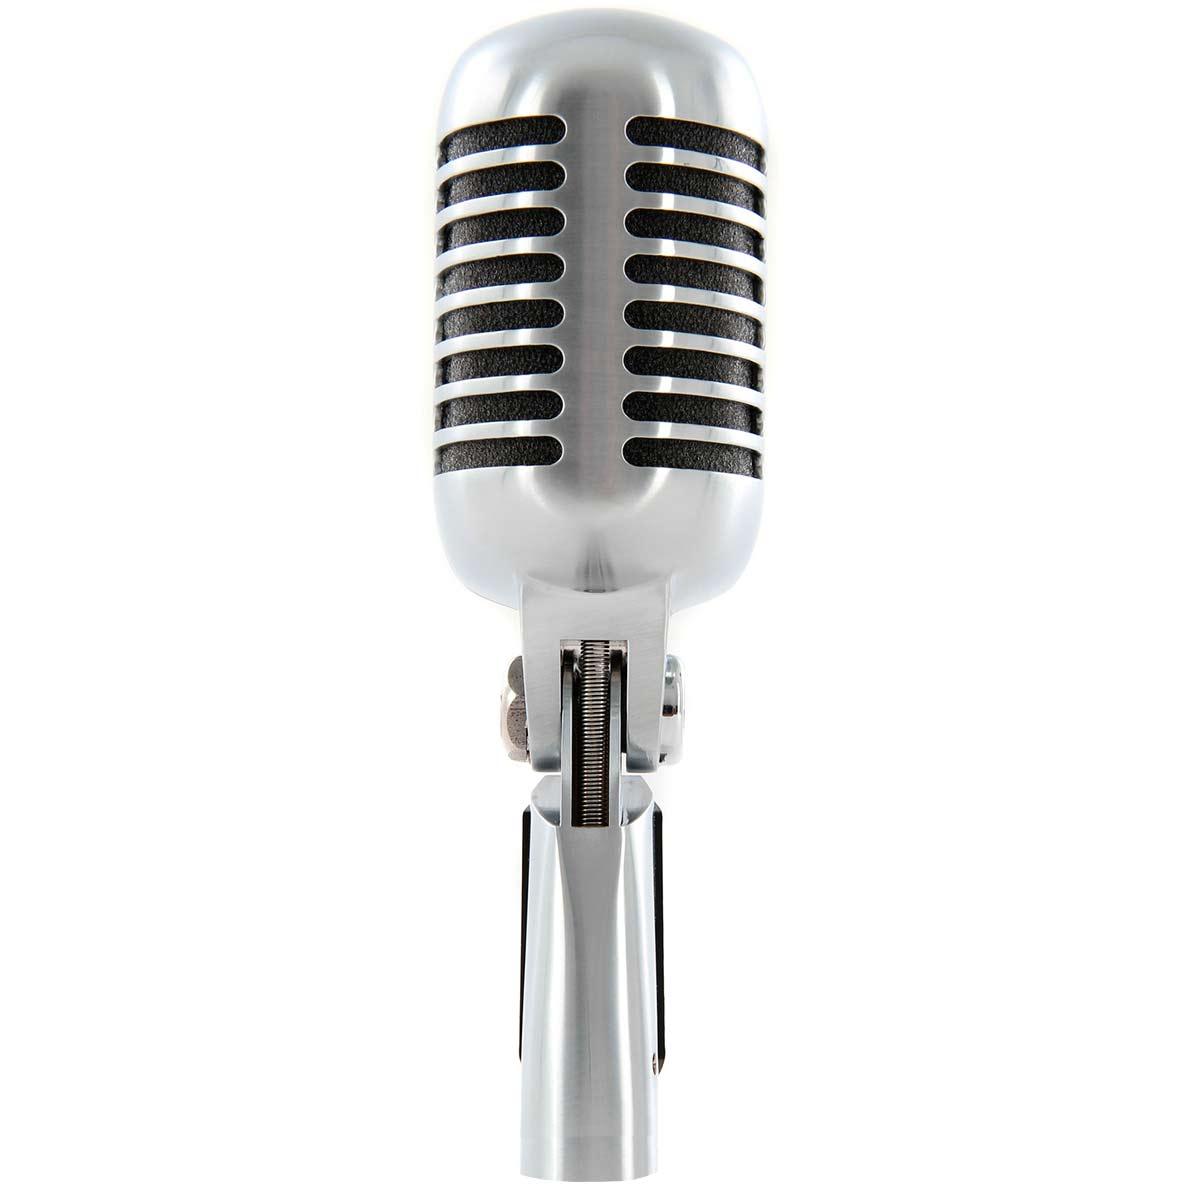 Microfone c/ Fio de Mão UNIDYNE 55 SH SERIES II - Shure